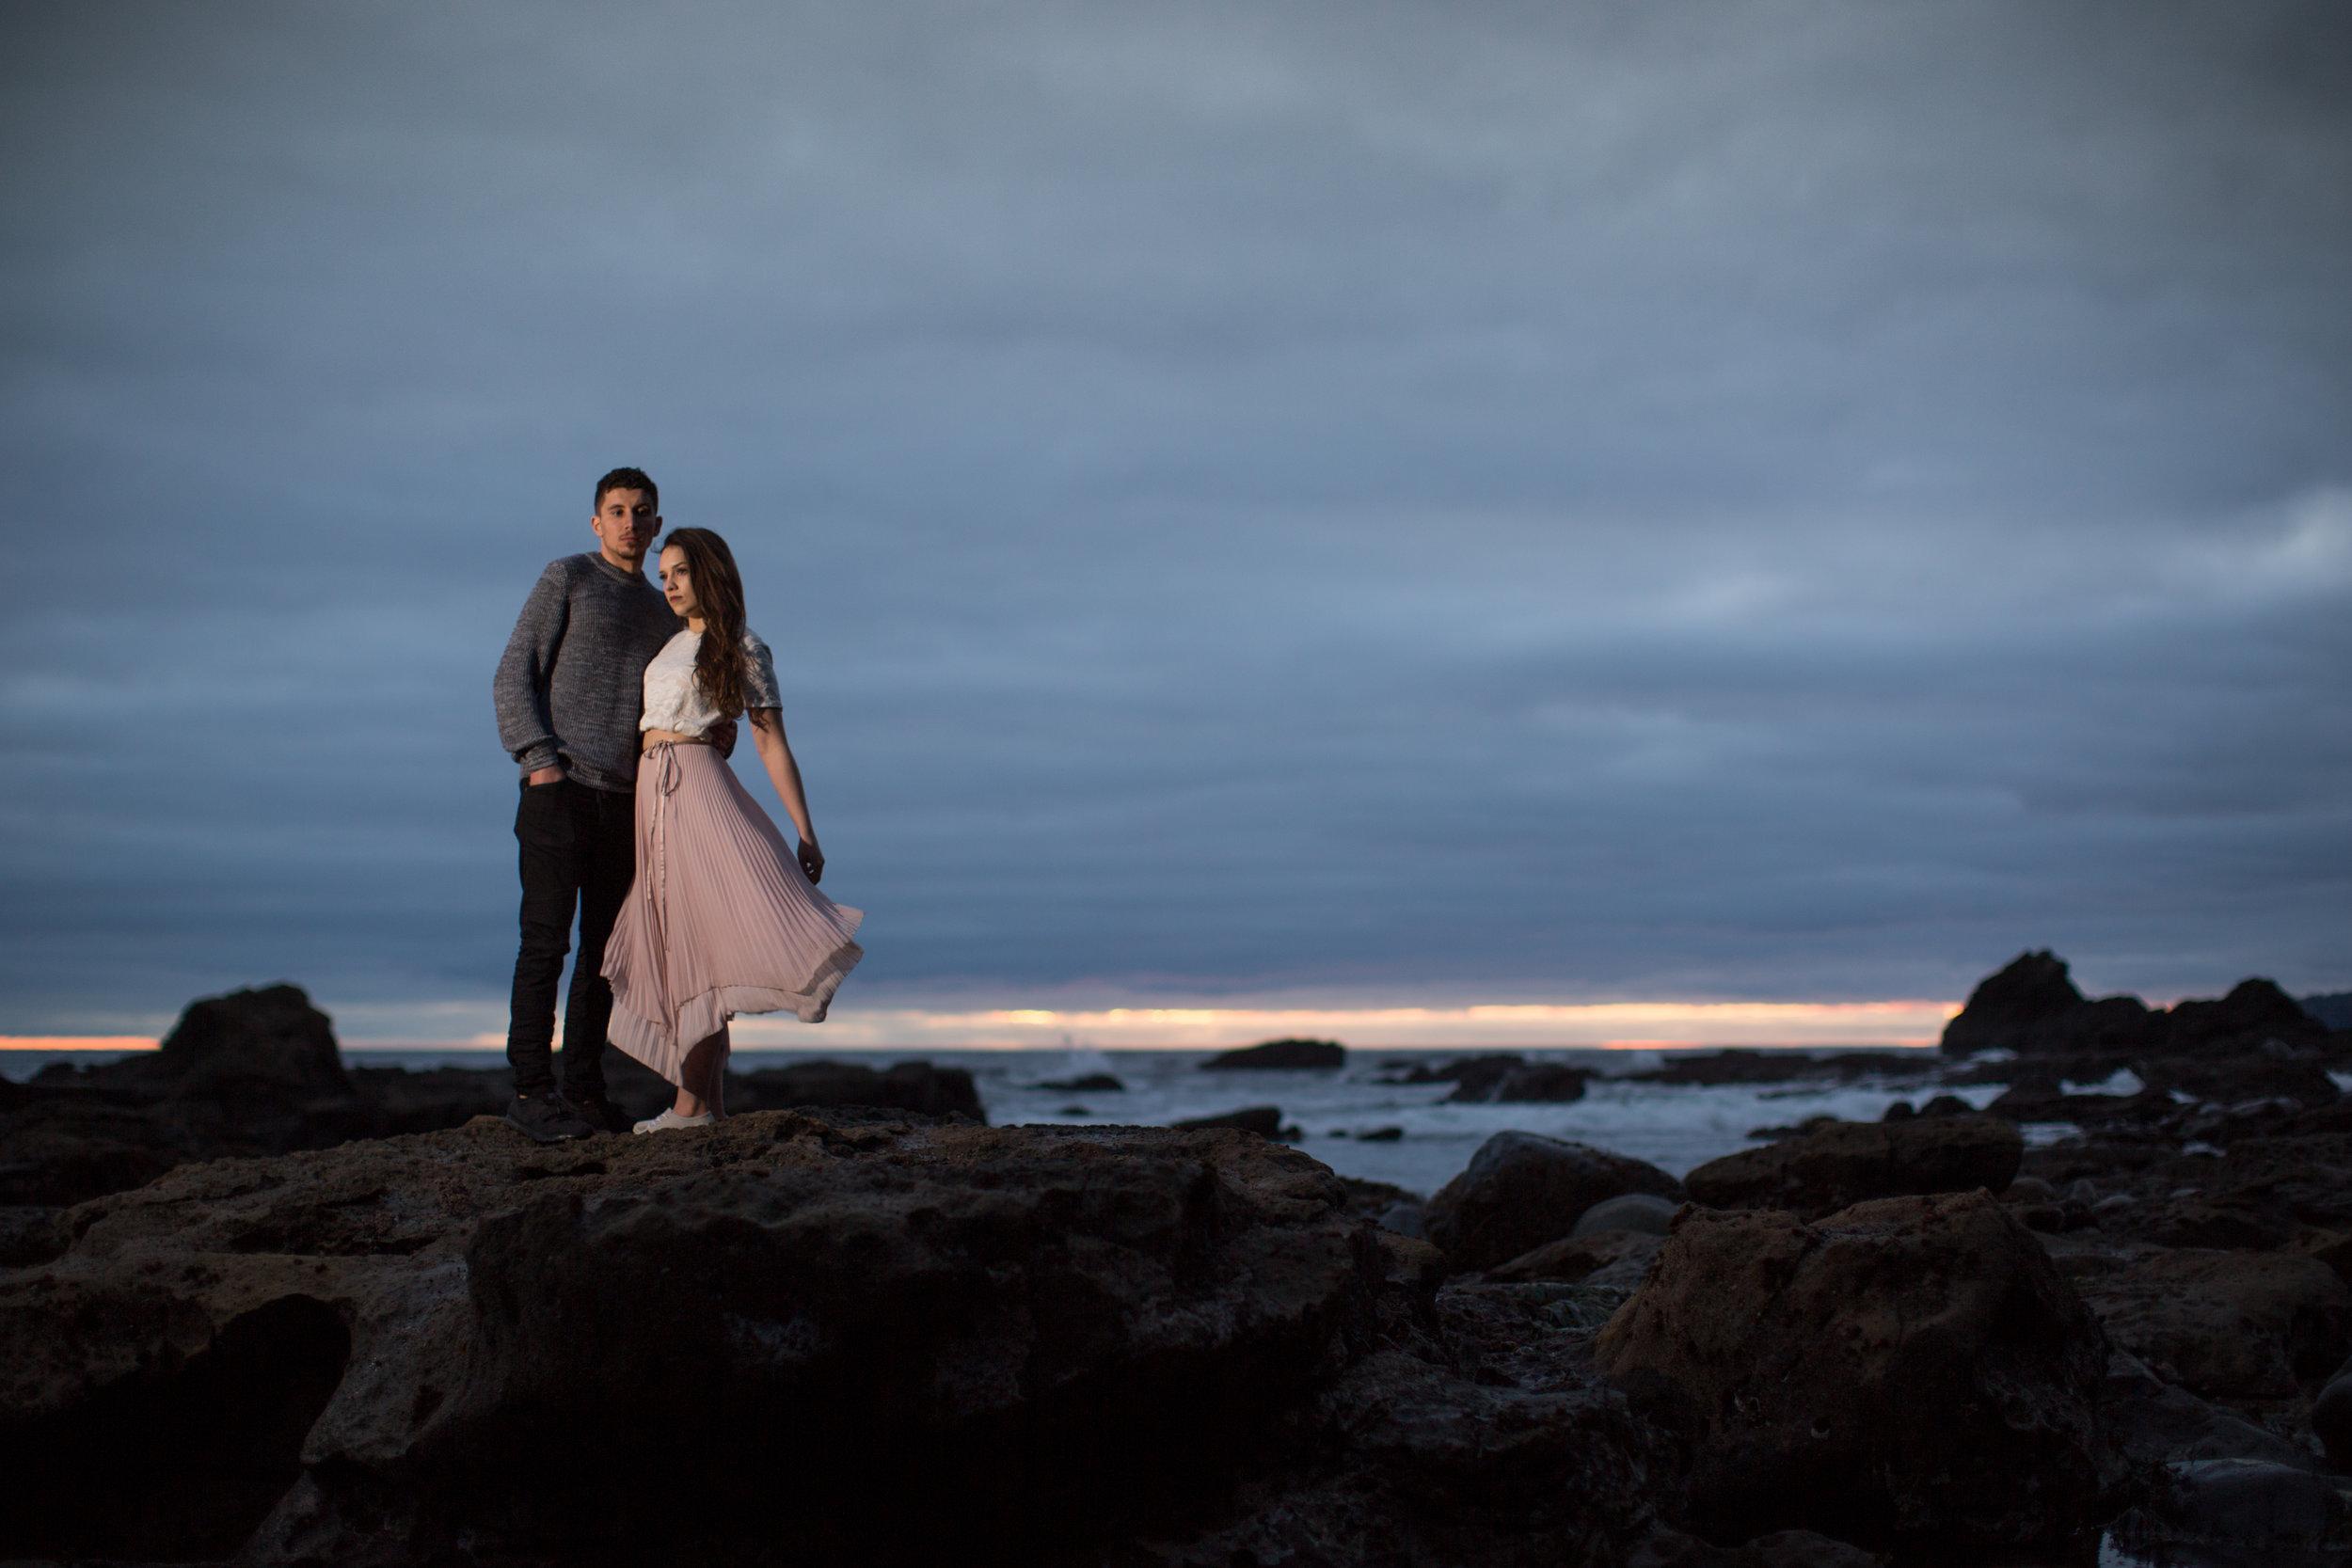 Adam-Ziorio-Photography-epic-juan-de-fuca-engagement-photos.jpg